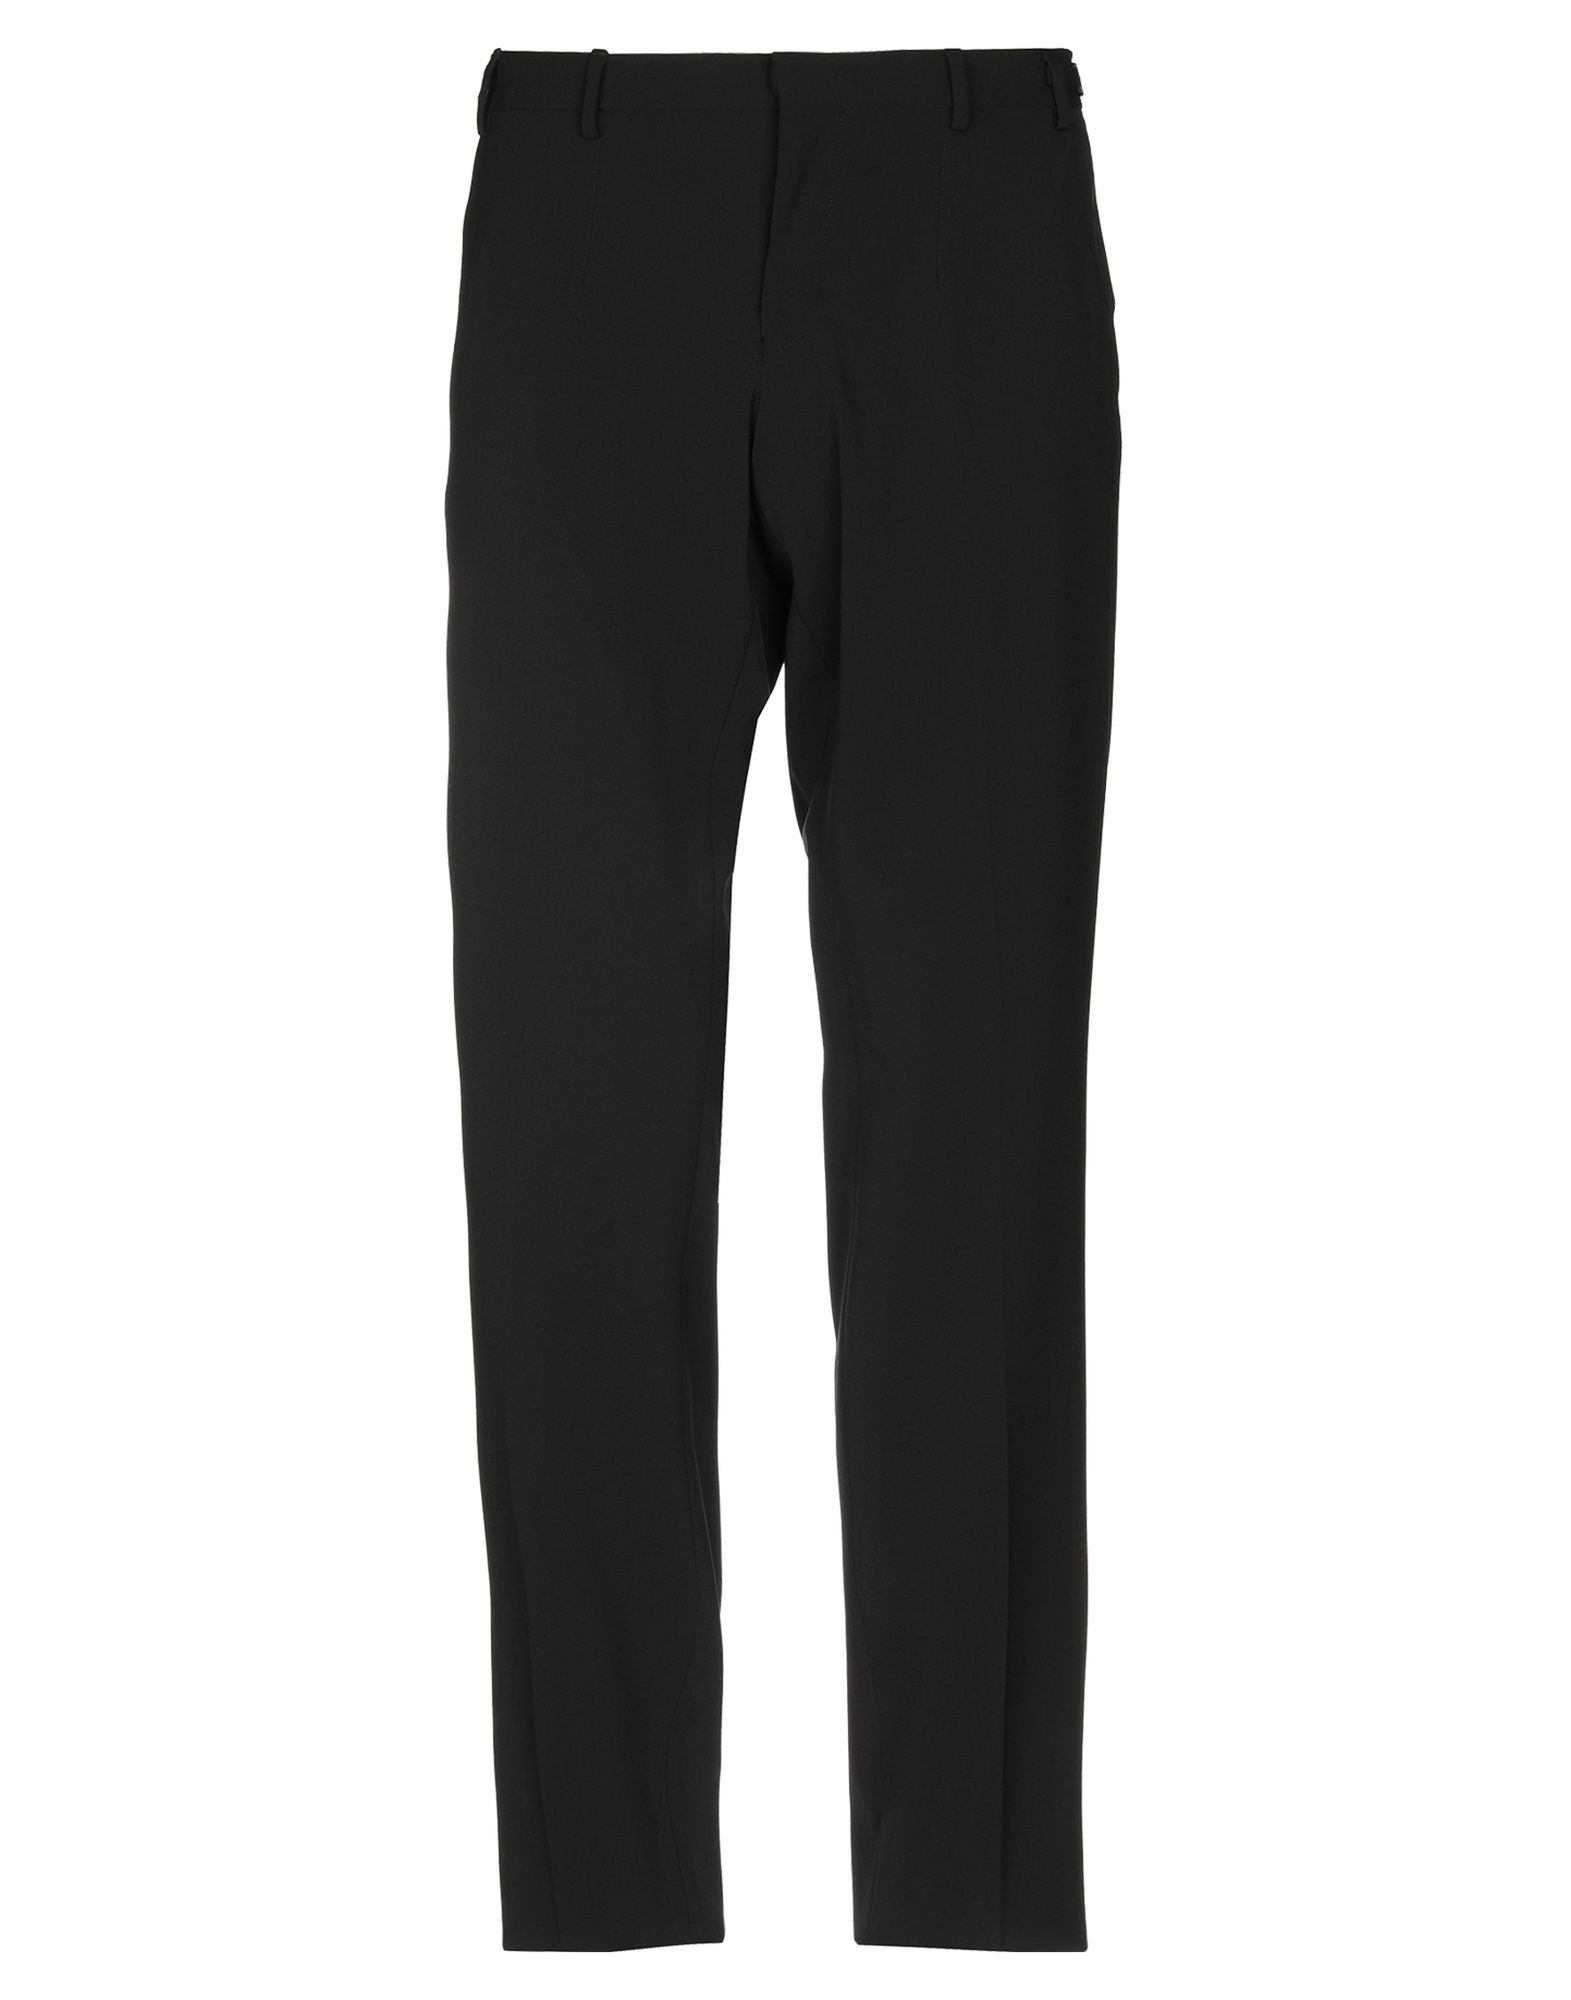 Pantalone Gazzarrini uomo - - - 13284241EX 323